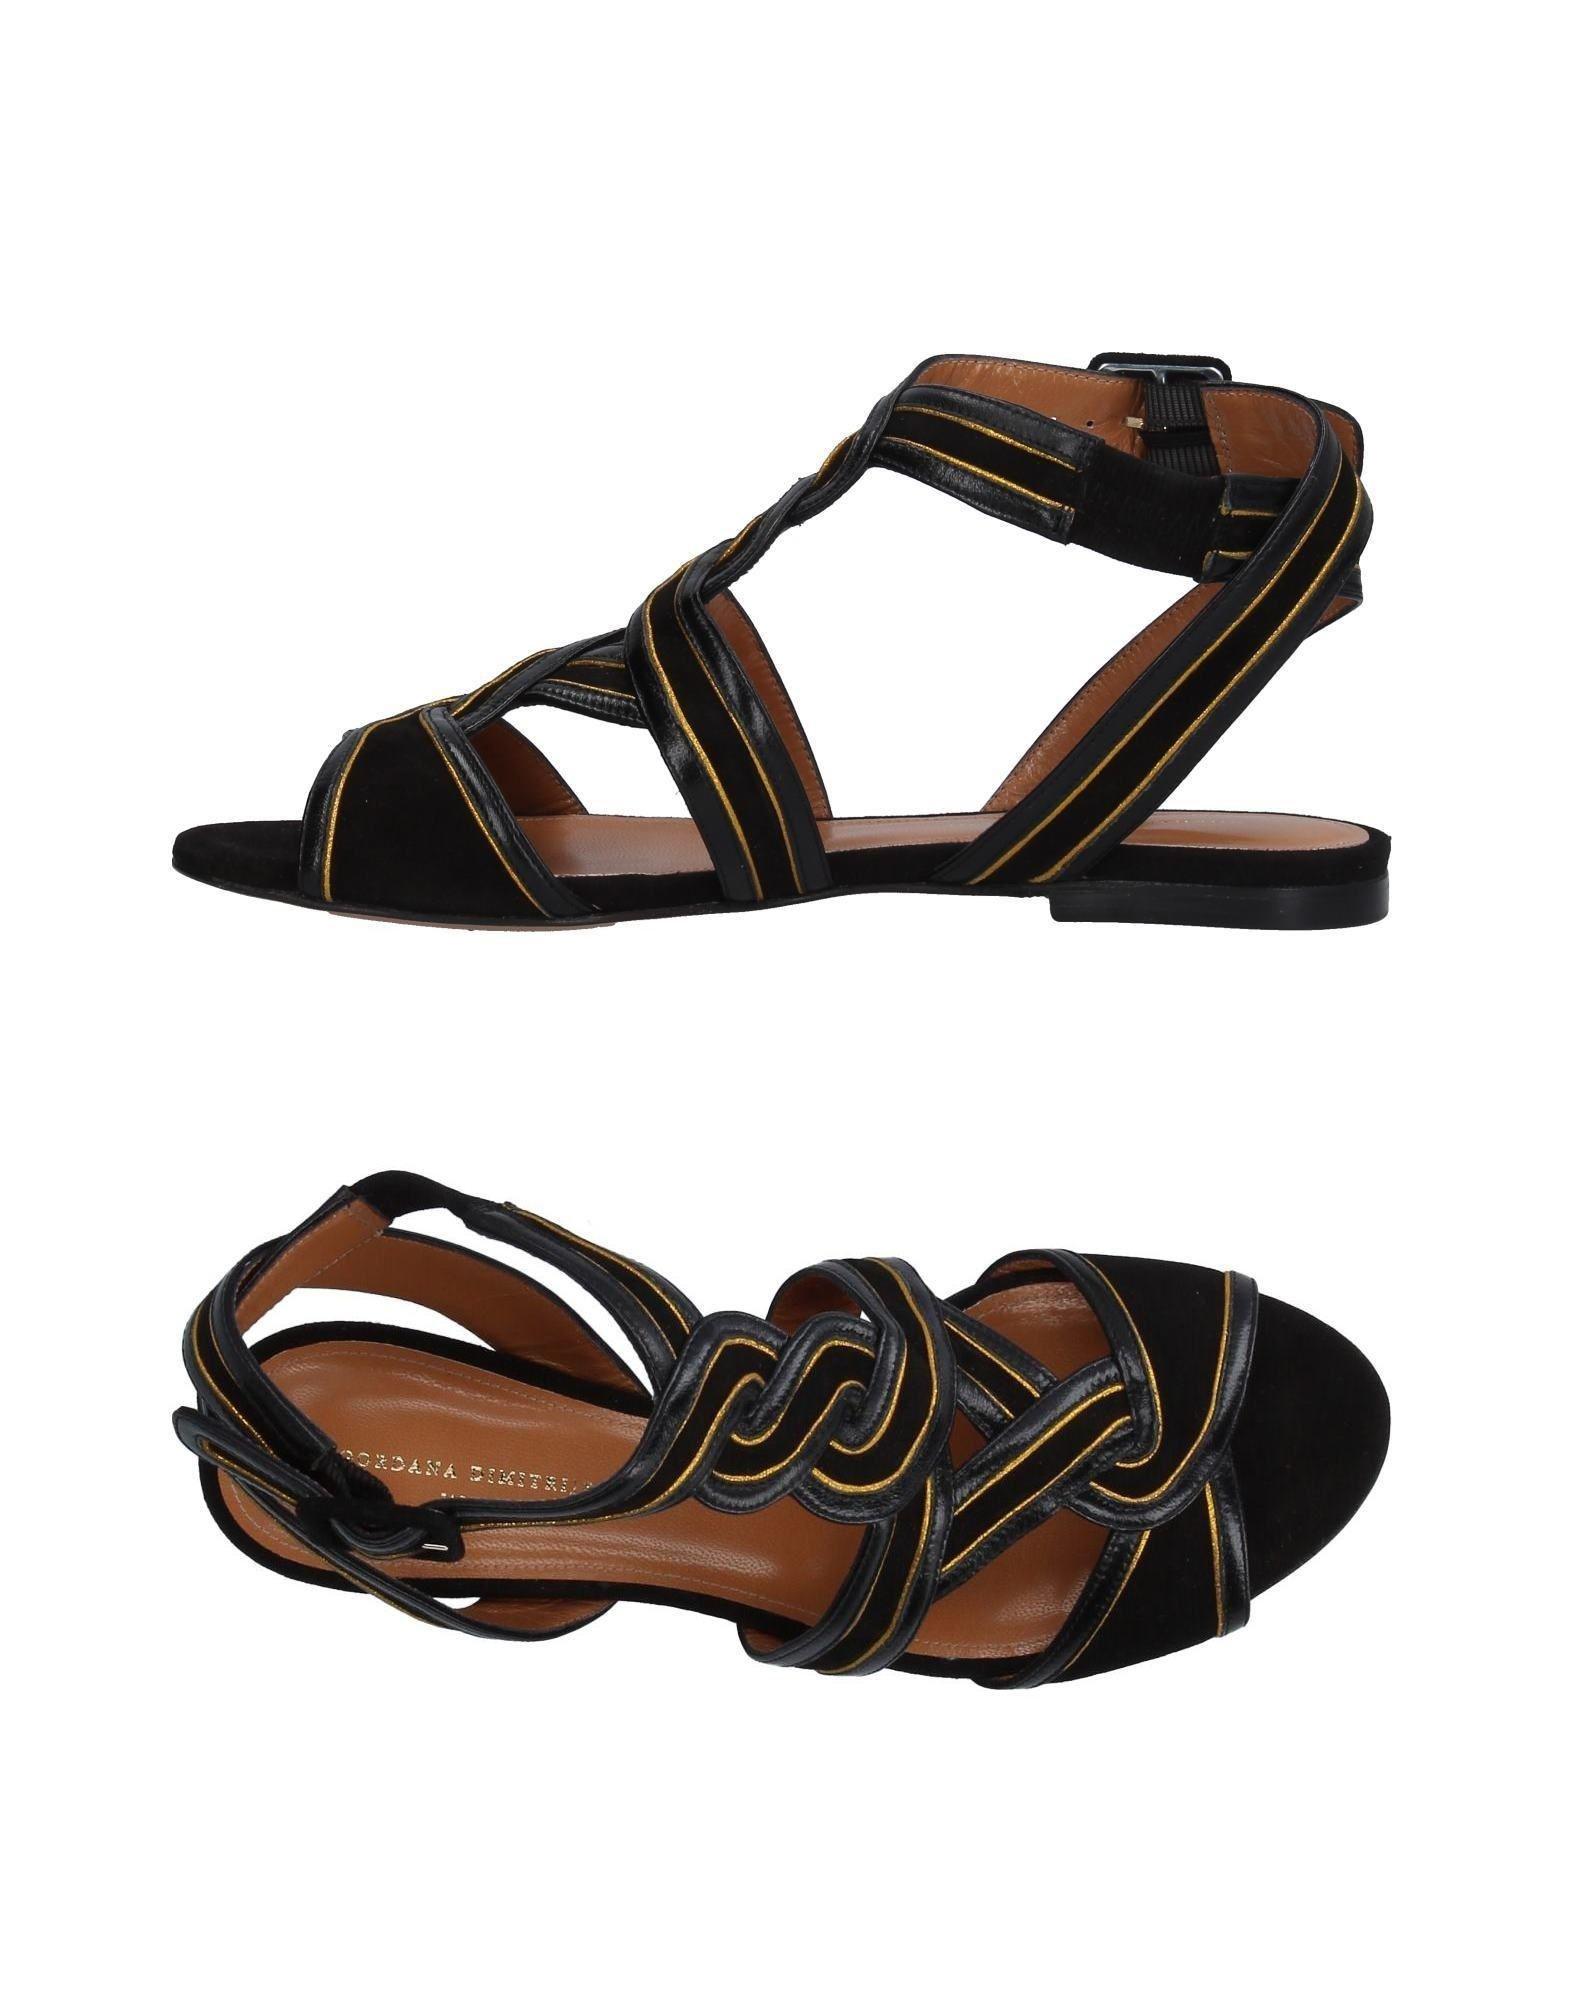 GORDANA DIMITRIJEVI? Leather Sandals Sale Low Shipping Really Cheap Online CBjo68